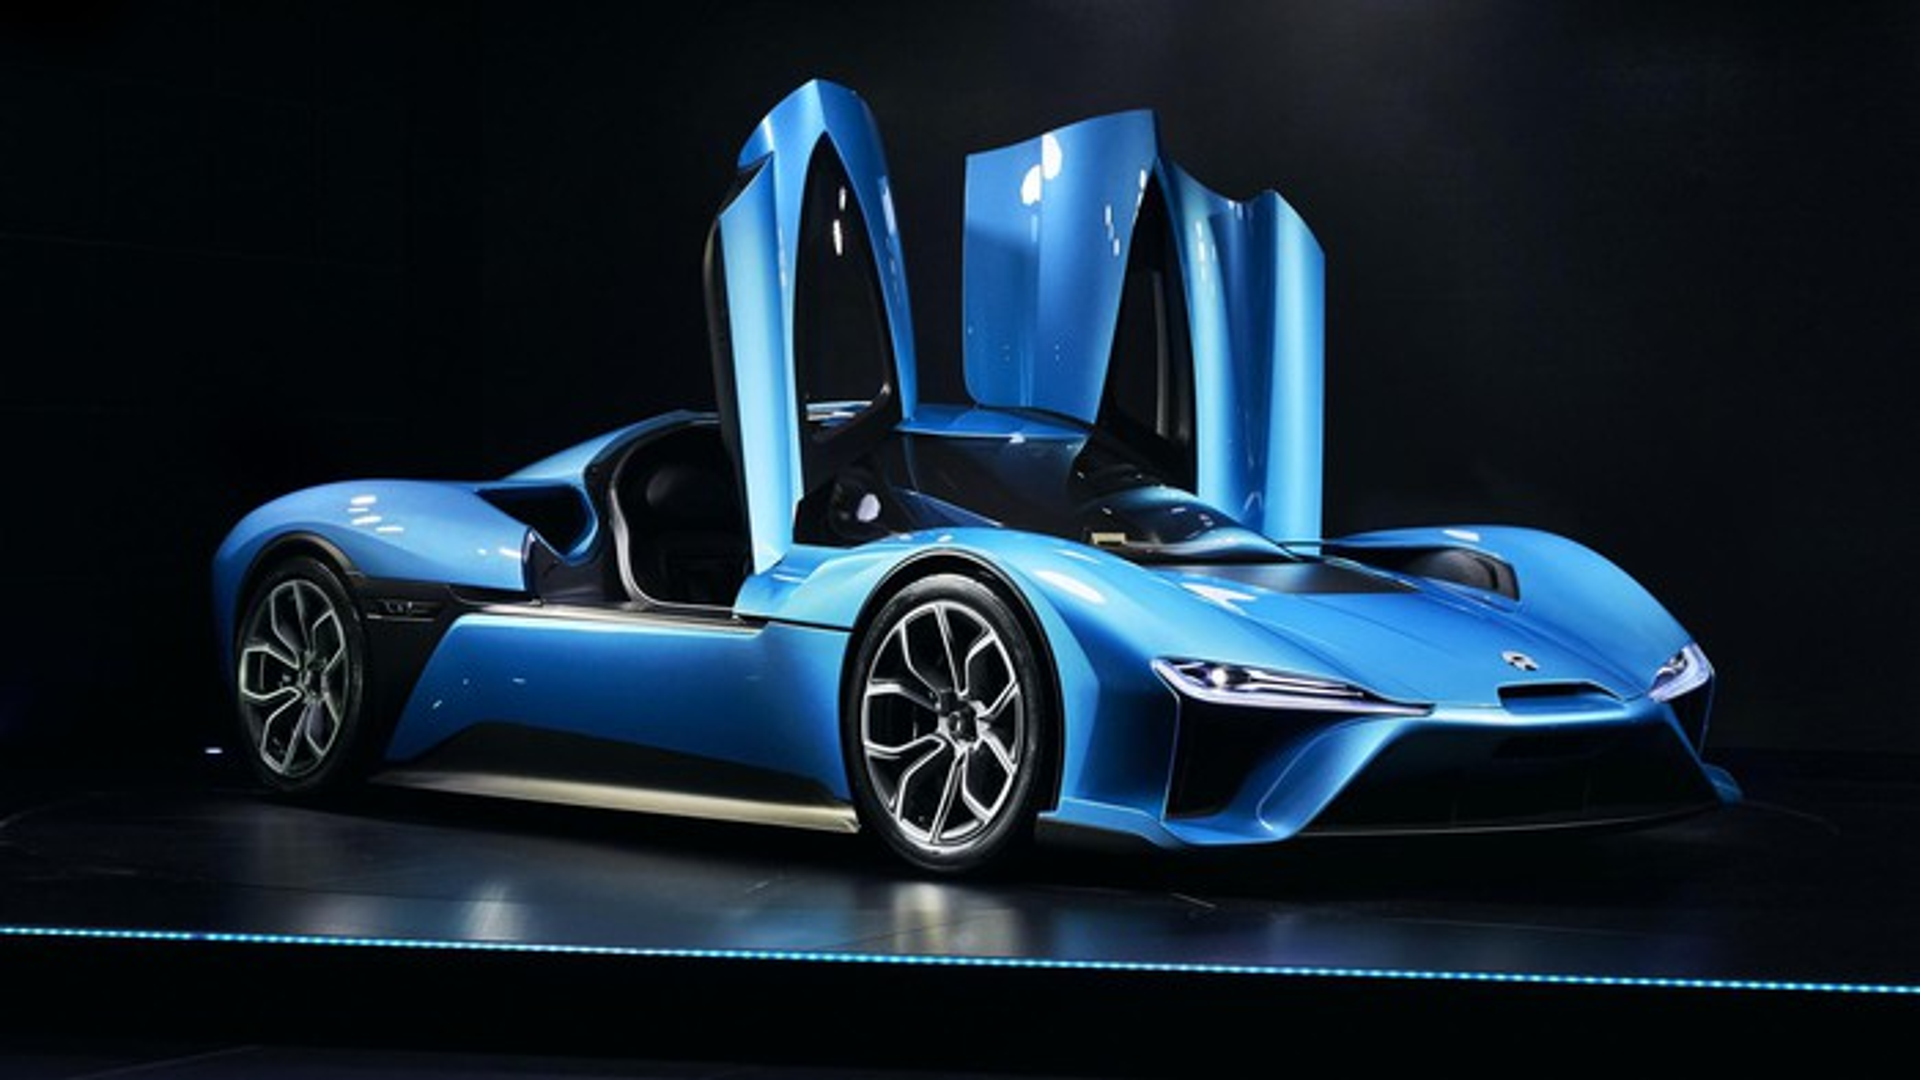 Sleek blue car with doors opening upward.